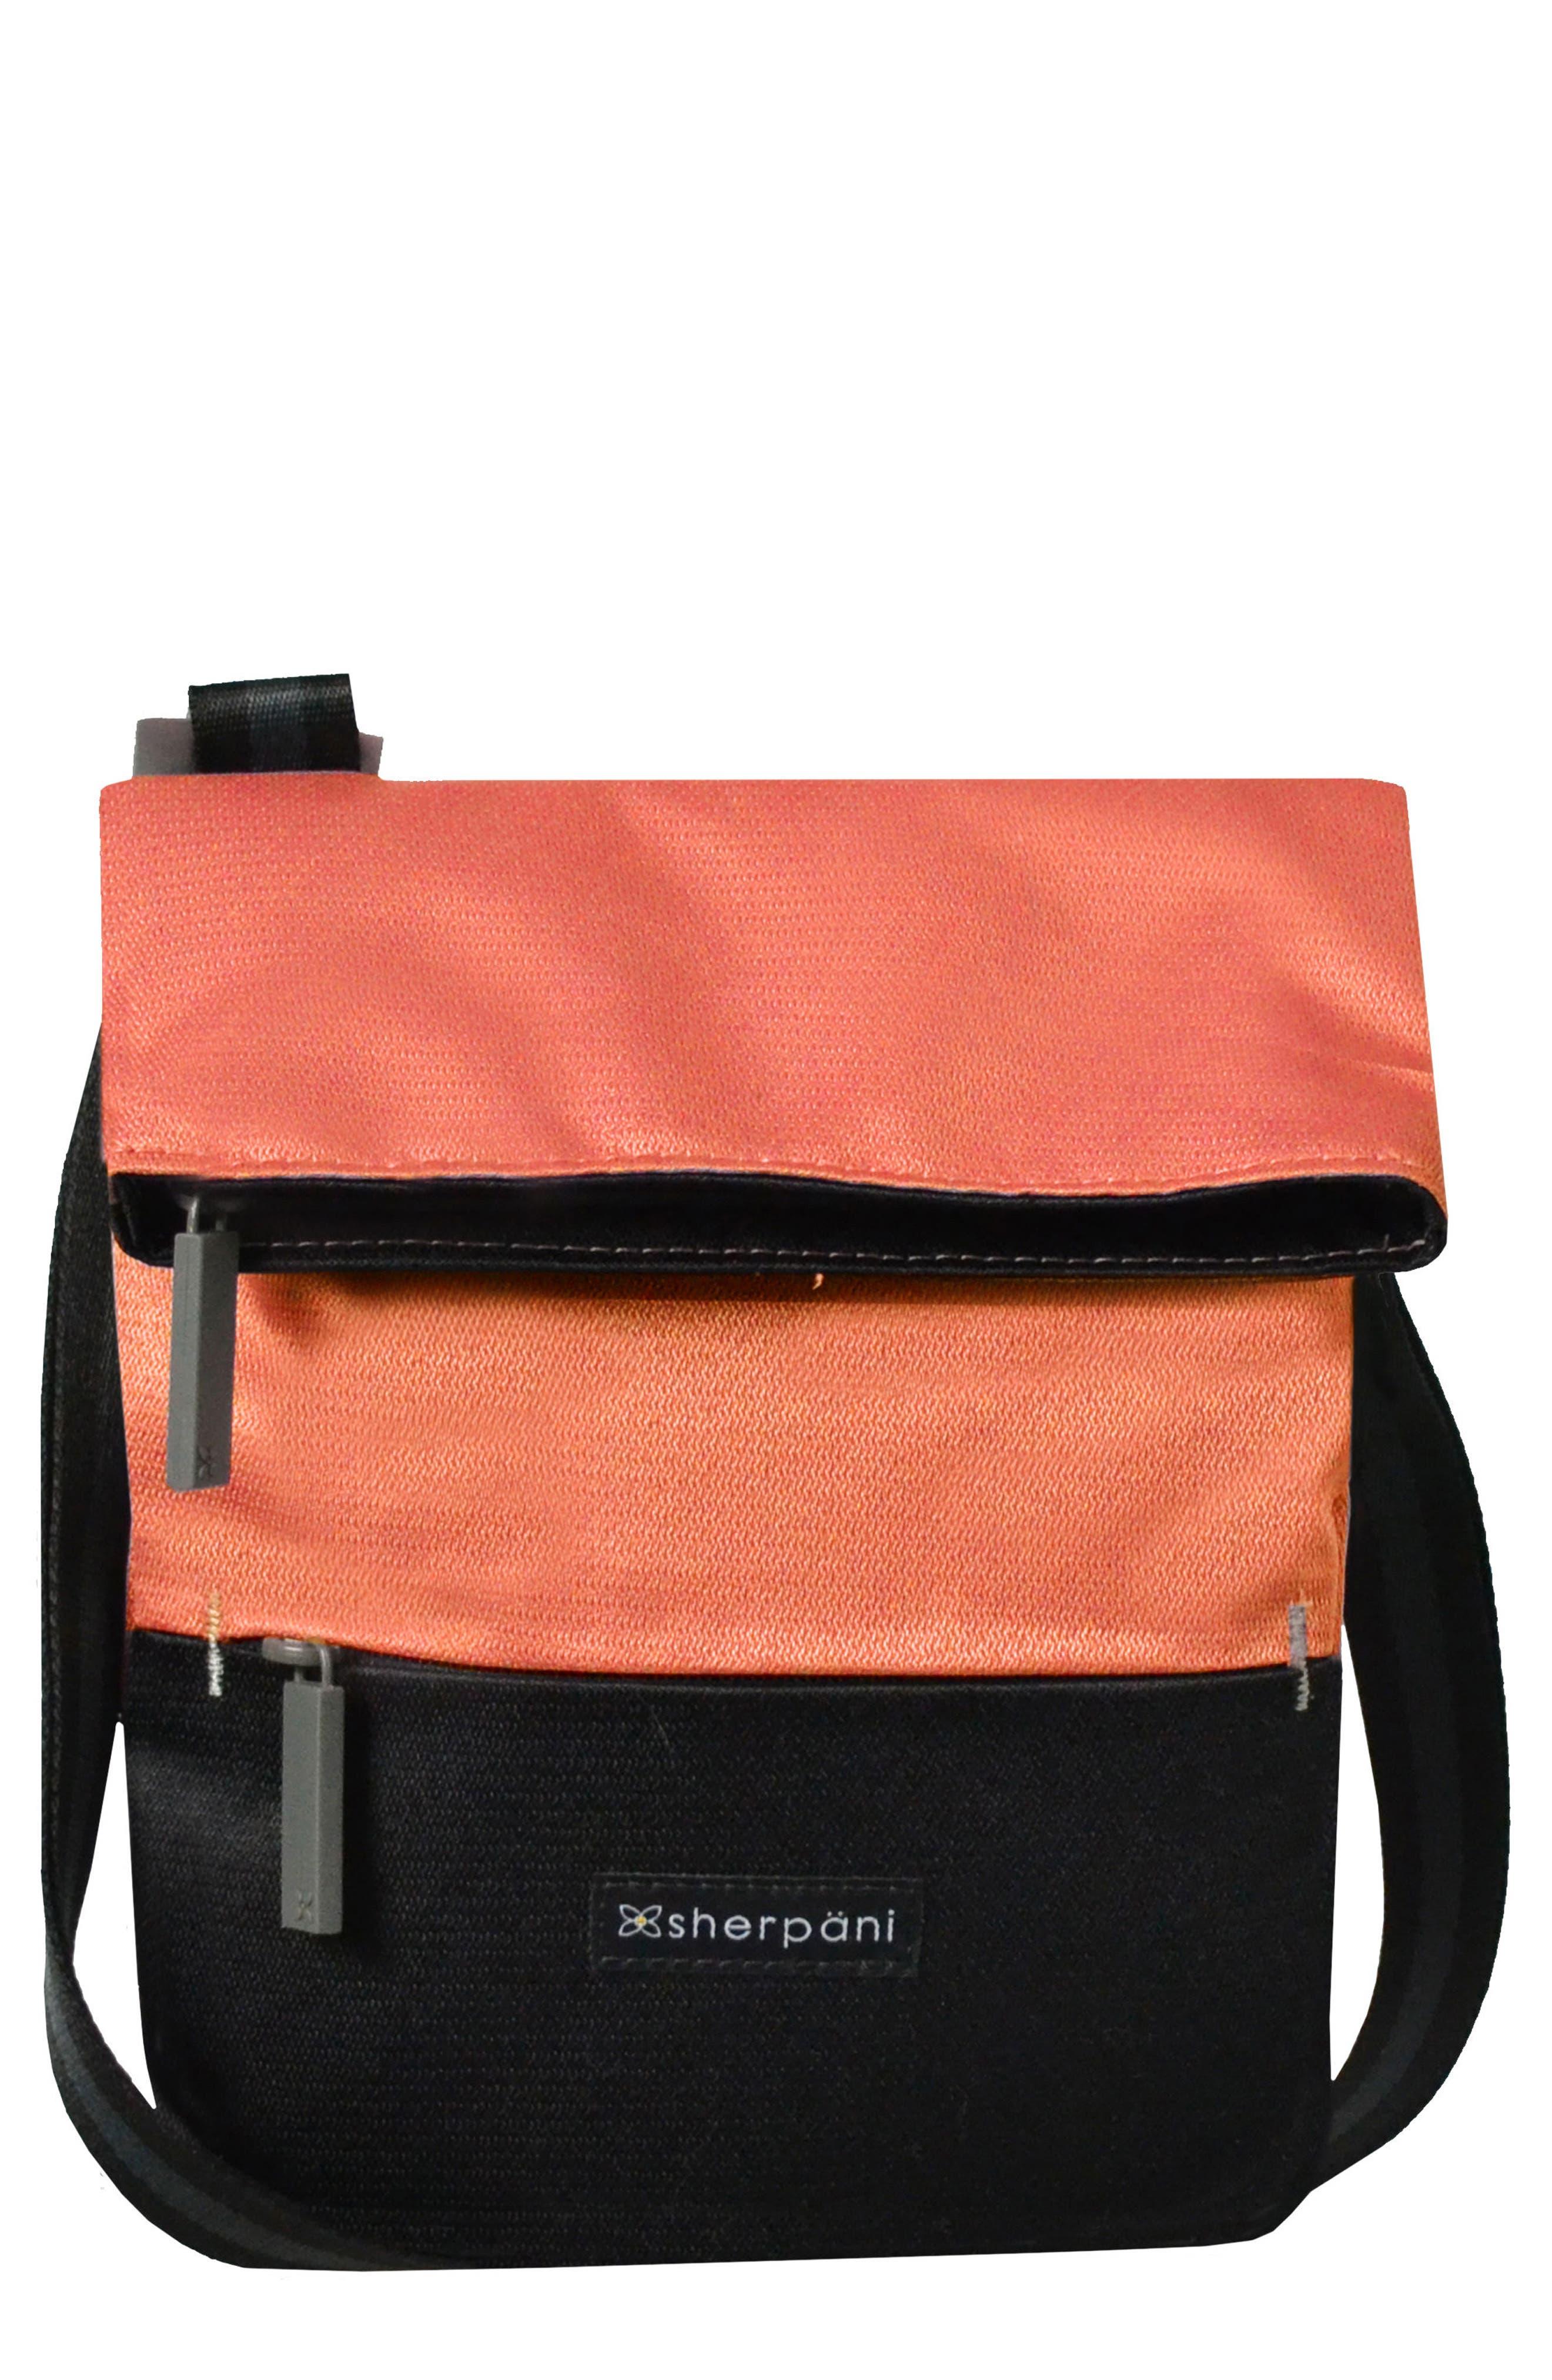 Main Image - Sherpani Small Pica Crossbody Bag